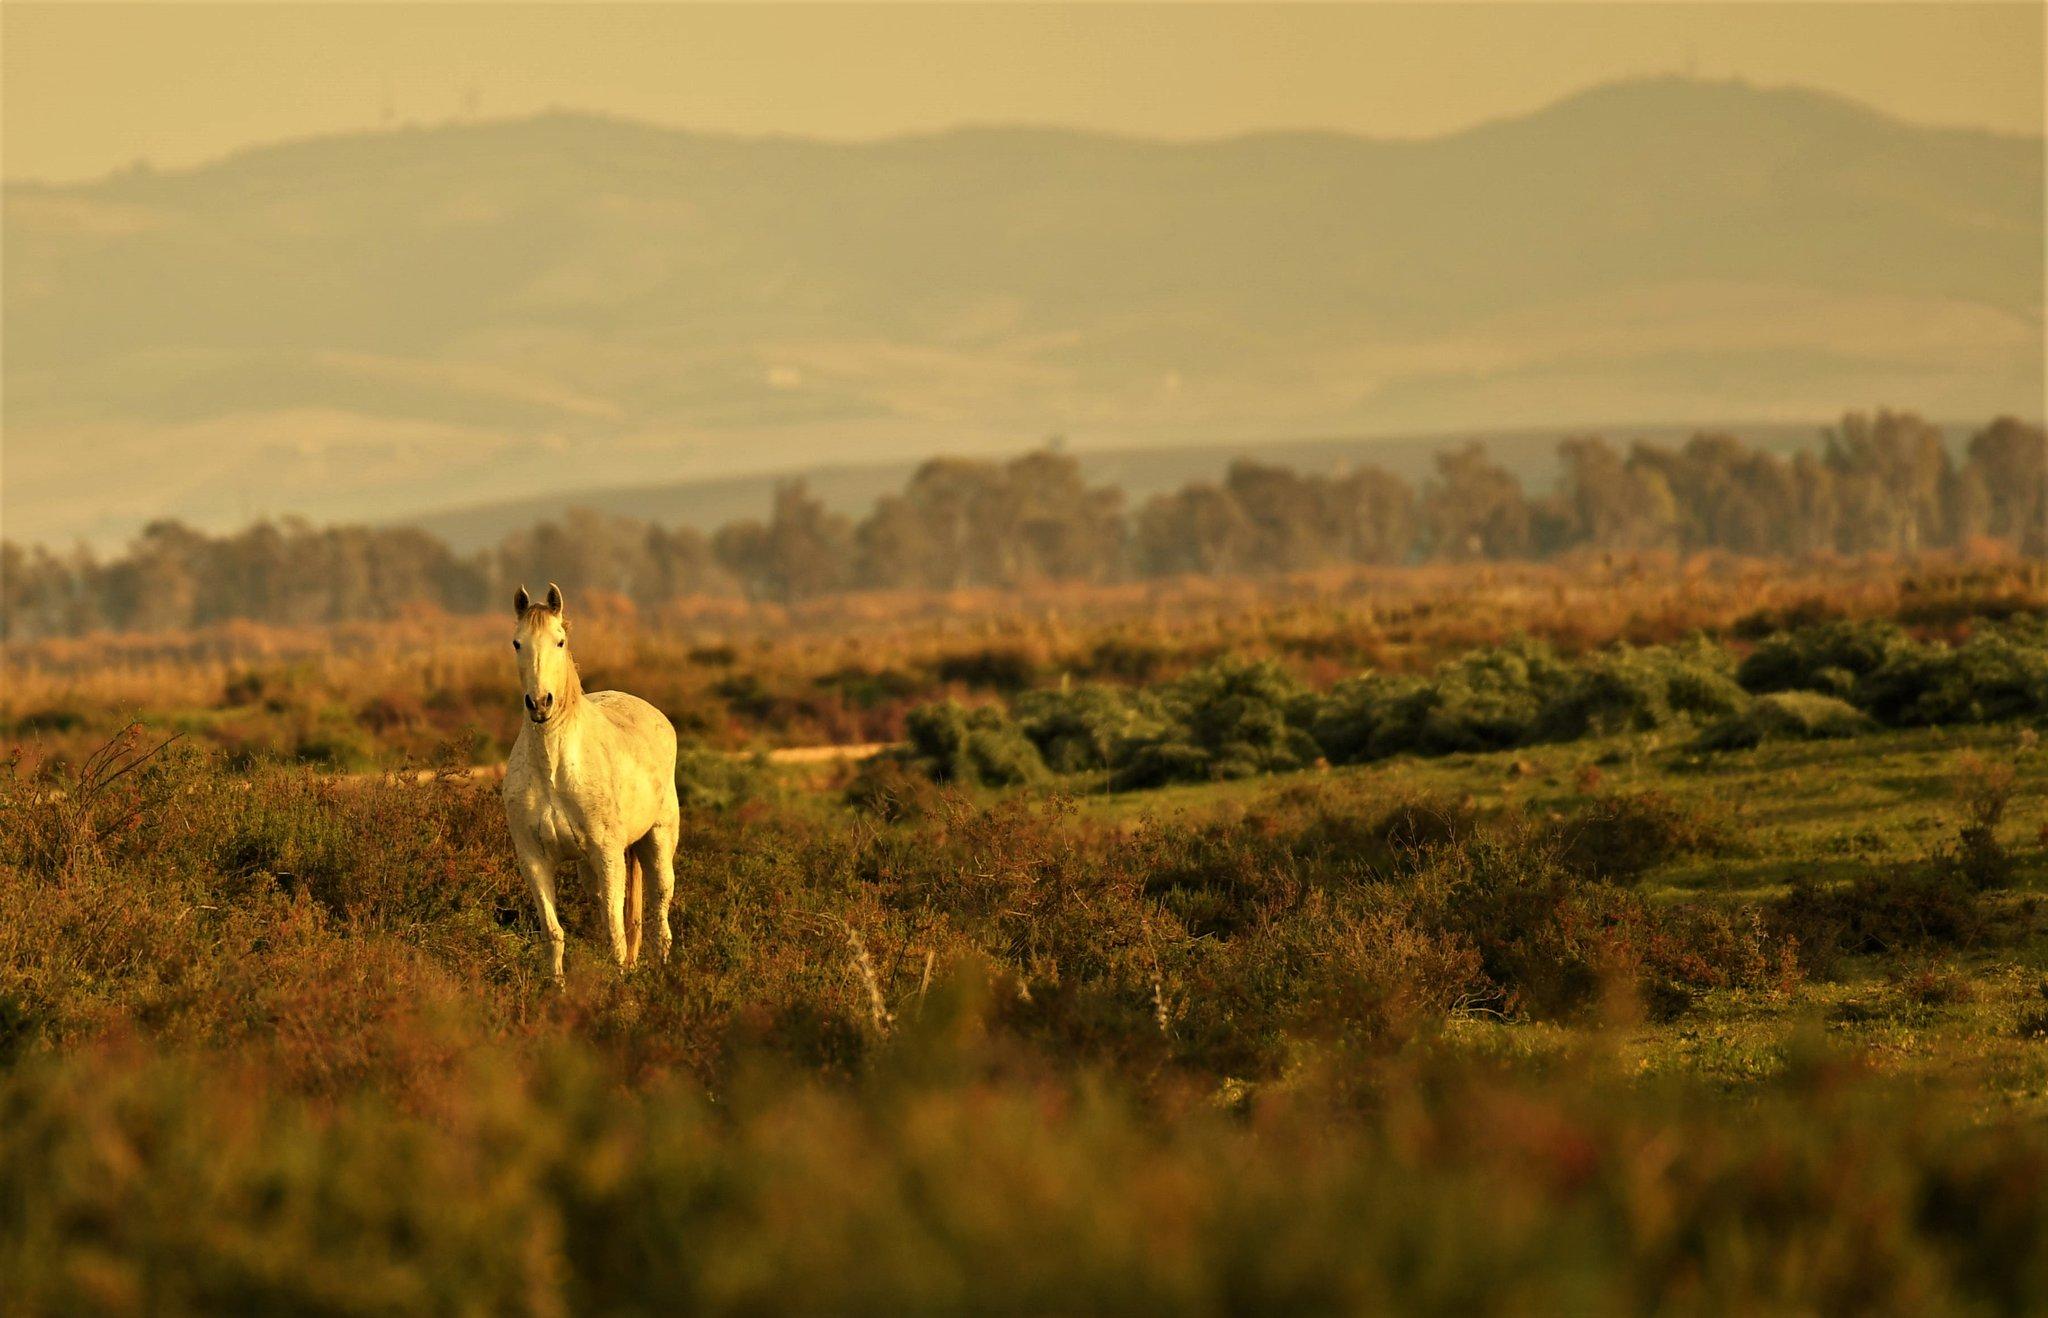 RT @carlosromeroco: Invernada Doñana Veta Palma 😍📷 Nikon D5 @Nikonistas @miradanatural @fotodng @AgendaDeFoto @viveandalucia @MARCANDALUCIA @TurismoDeporAND https://t.co/frlAcywDzi